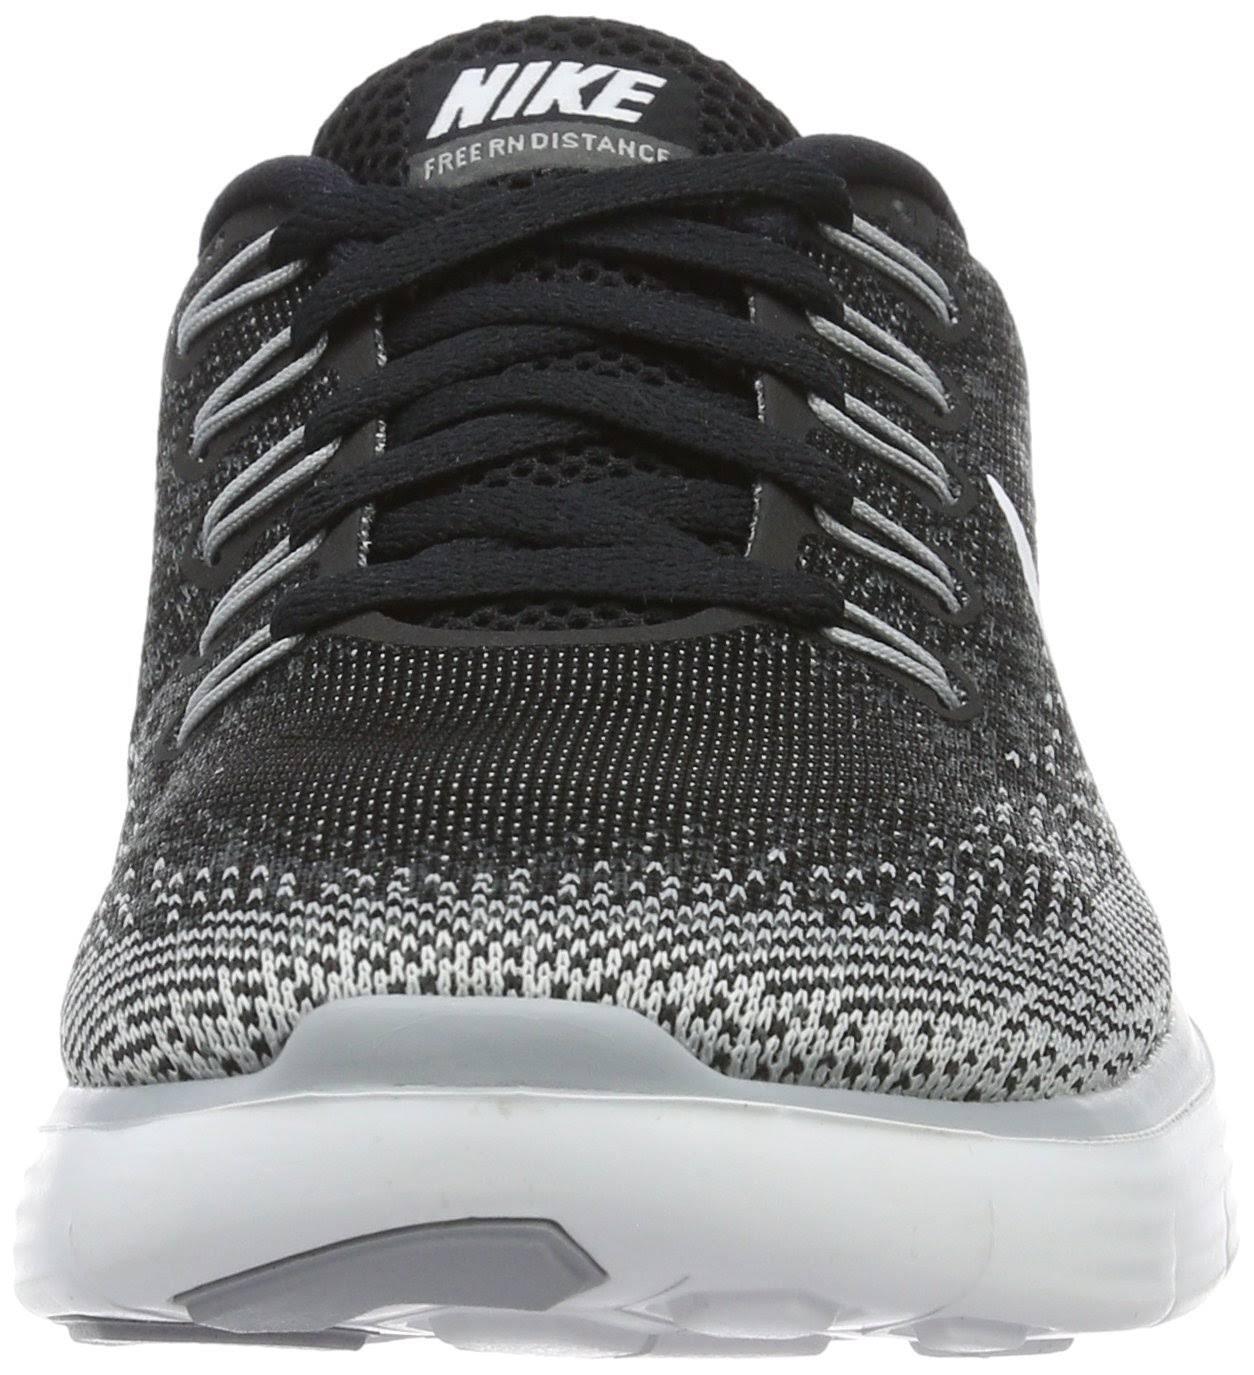 9 Nike Distance Free Almacén B Rn De Desde Gris Running Kelly's Para Negro El Mujer 0a0rwxqF